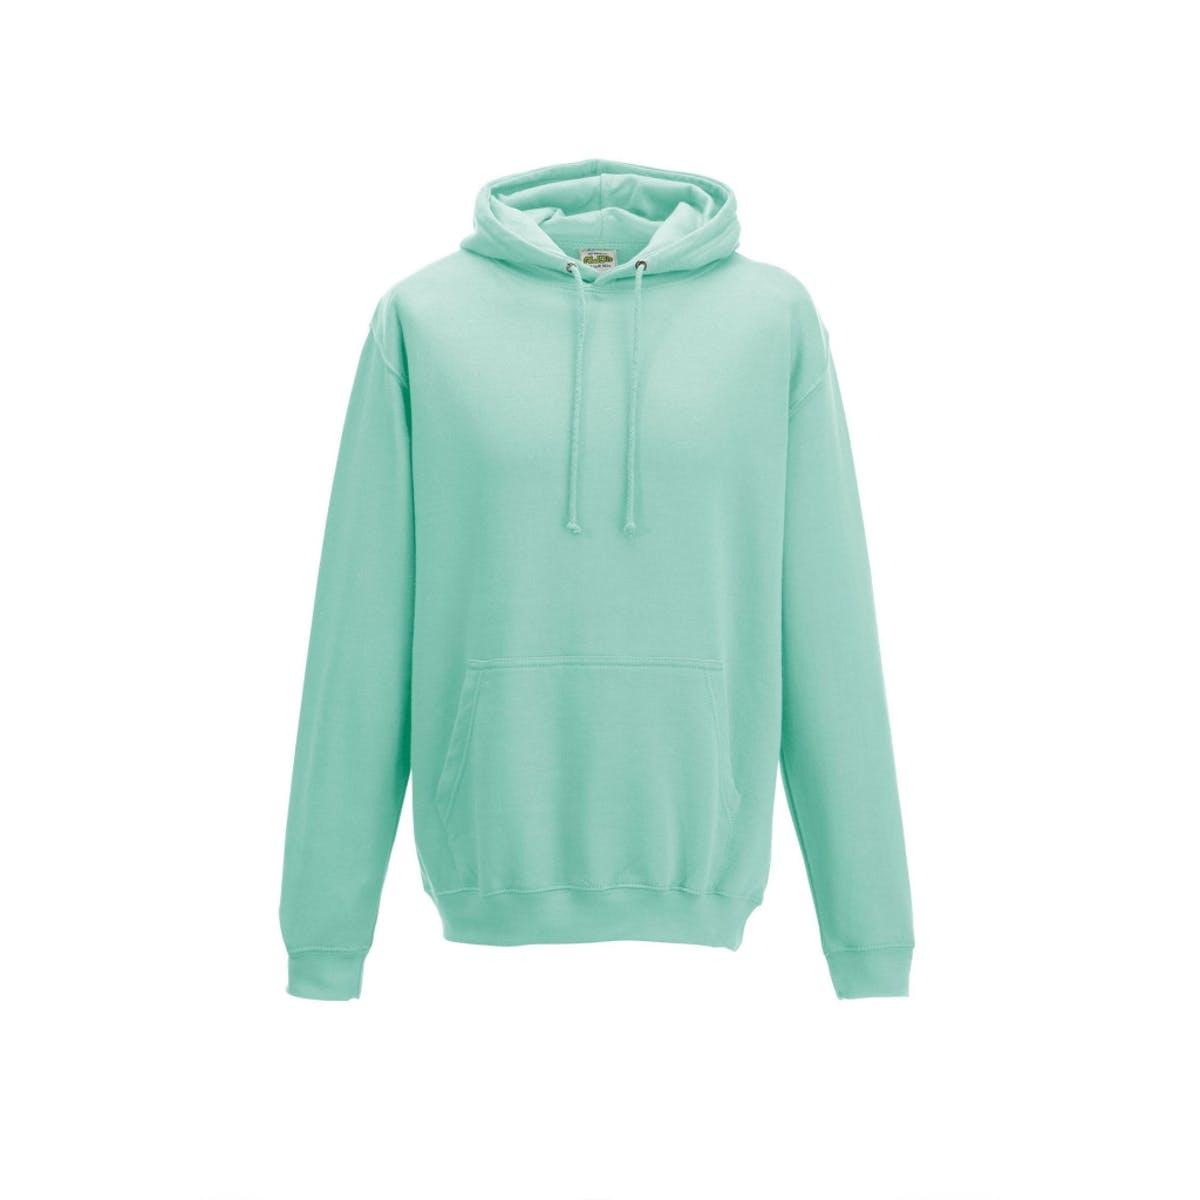 peppermint college hoodies